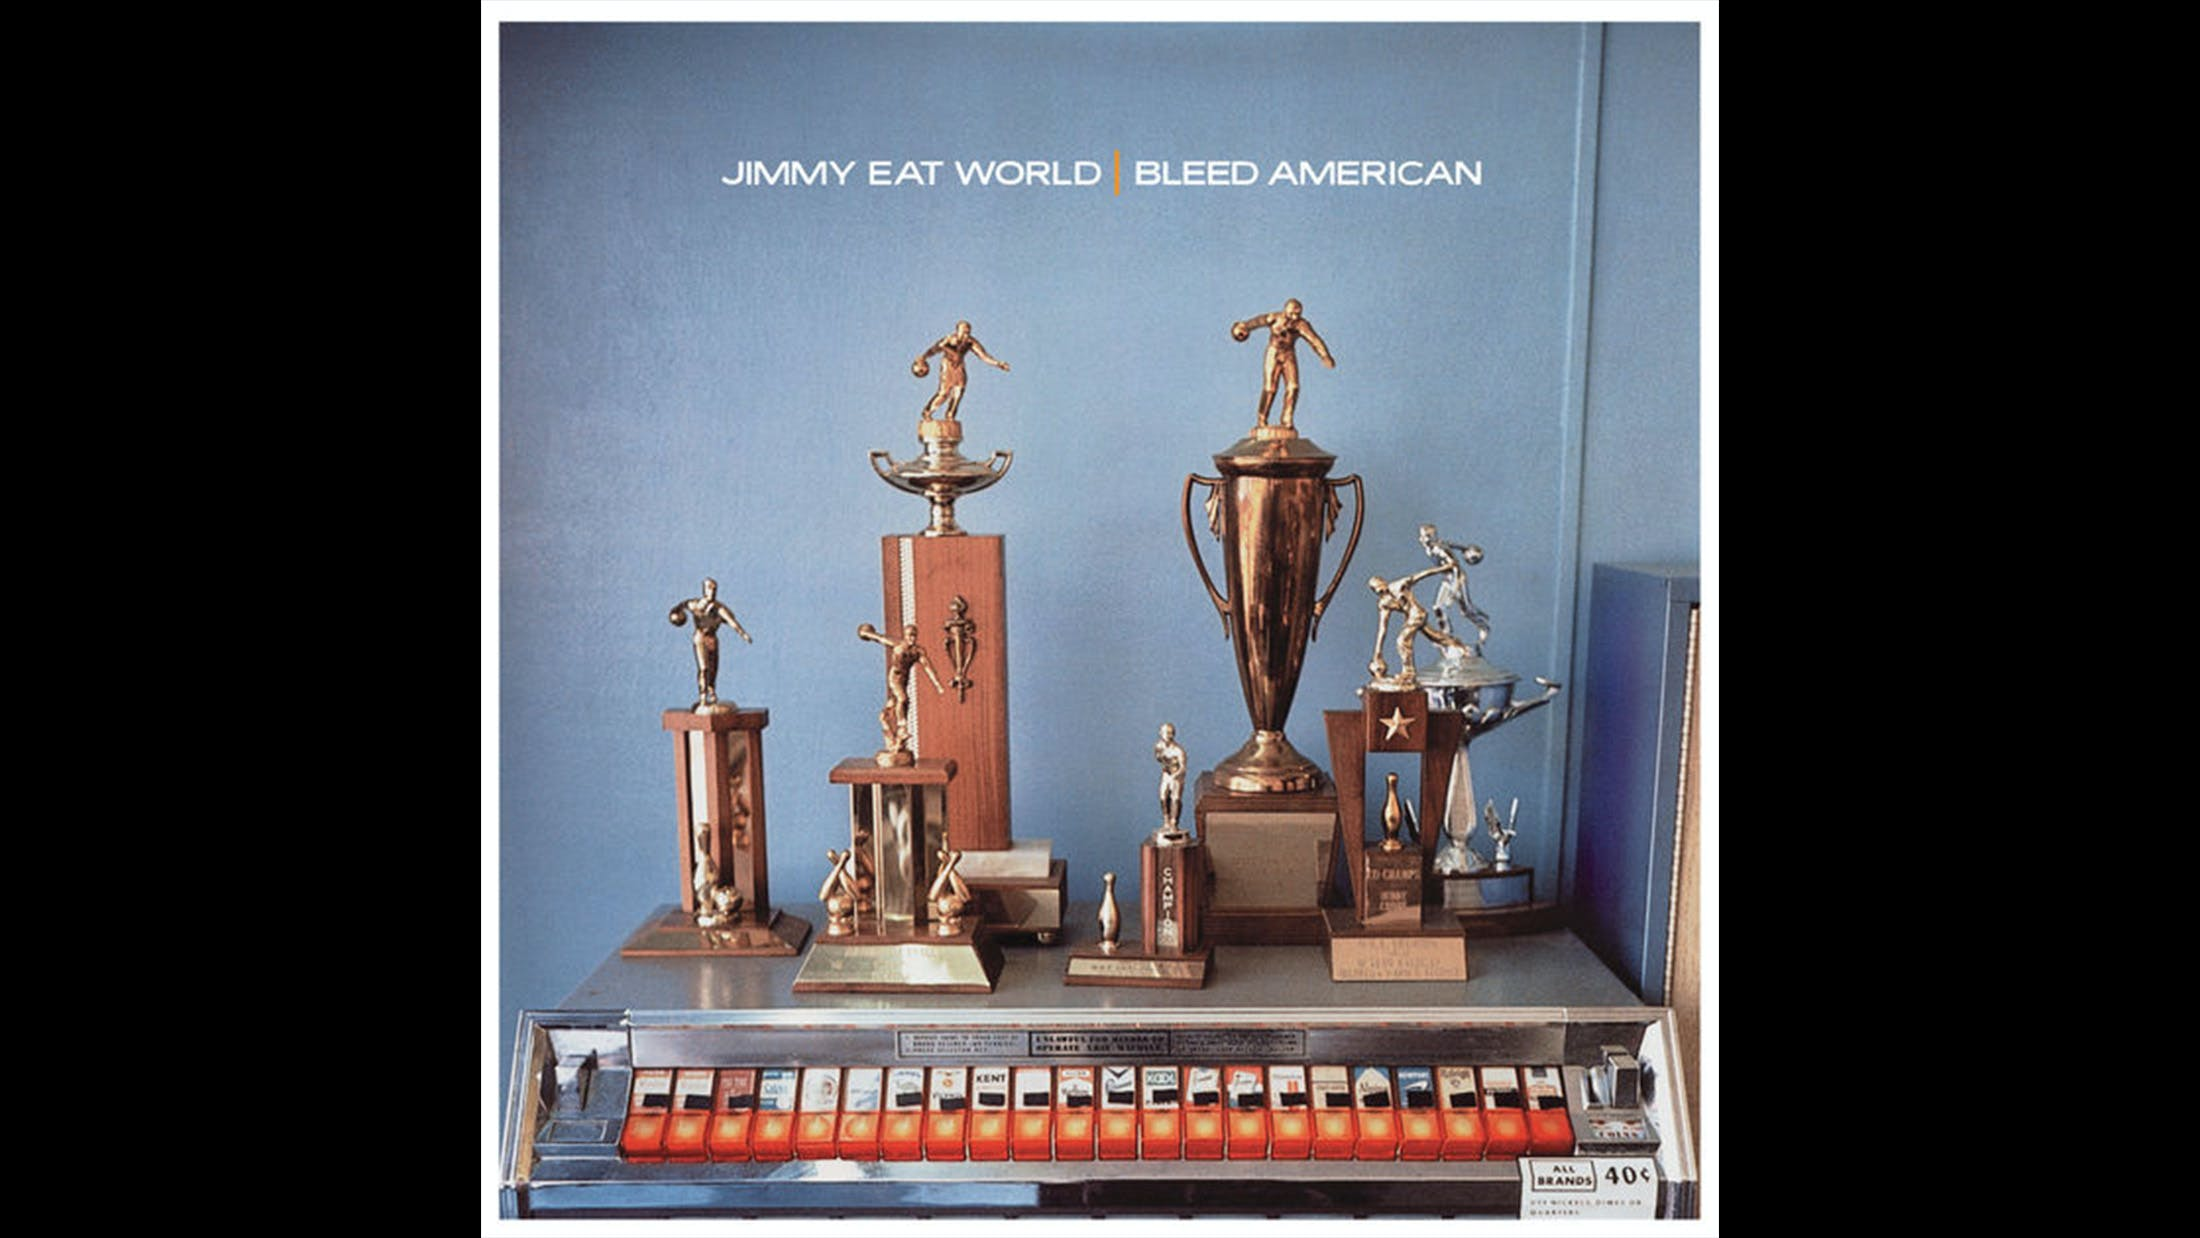 32. Jimmy Eat World - Bleed American (2001)